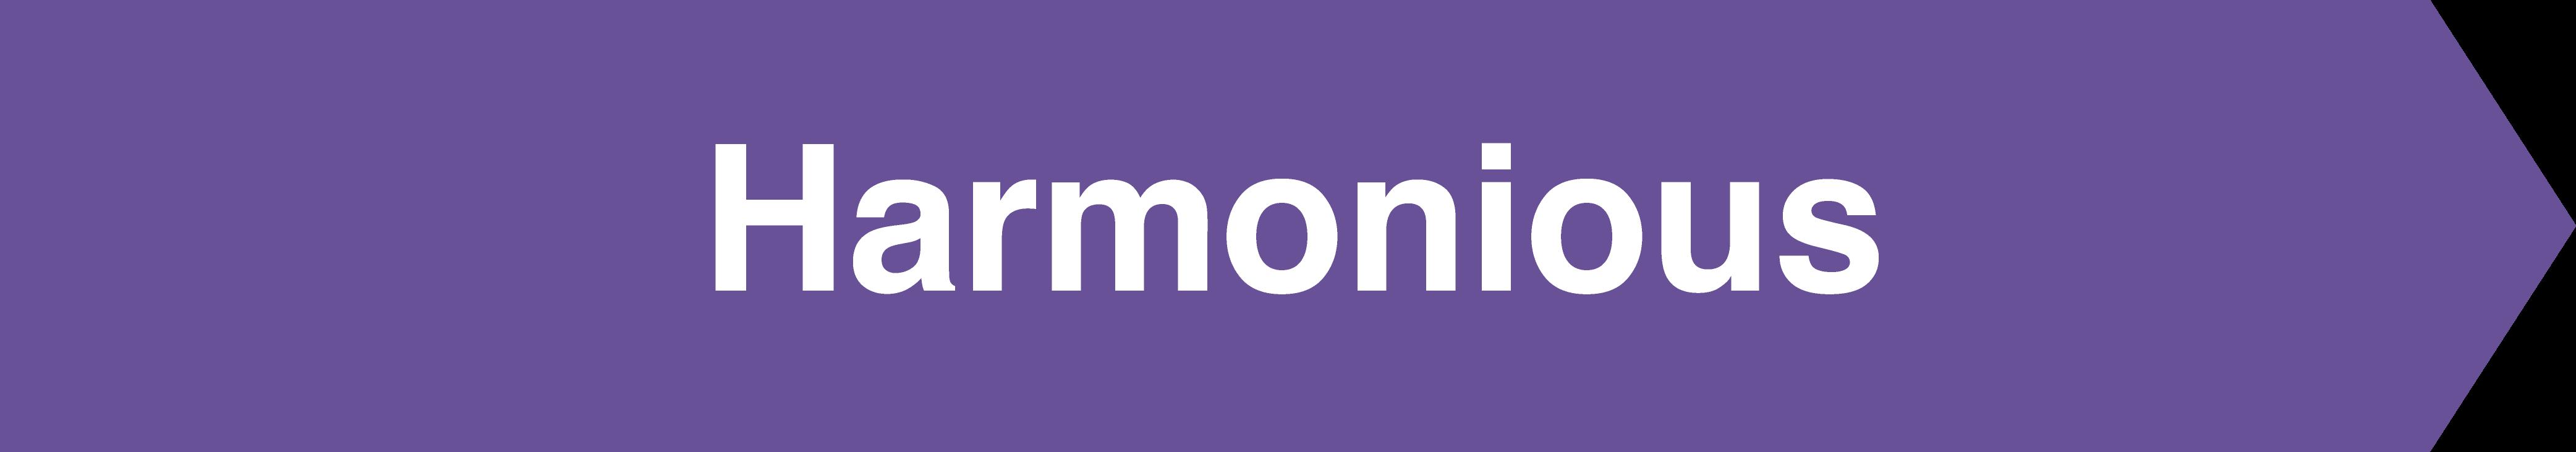 Harmonious